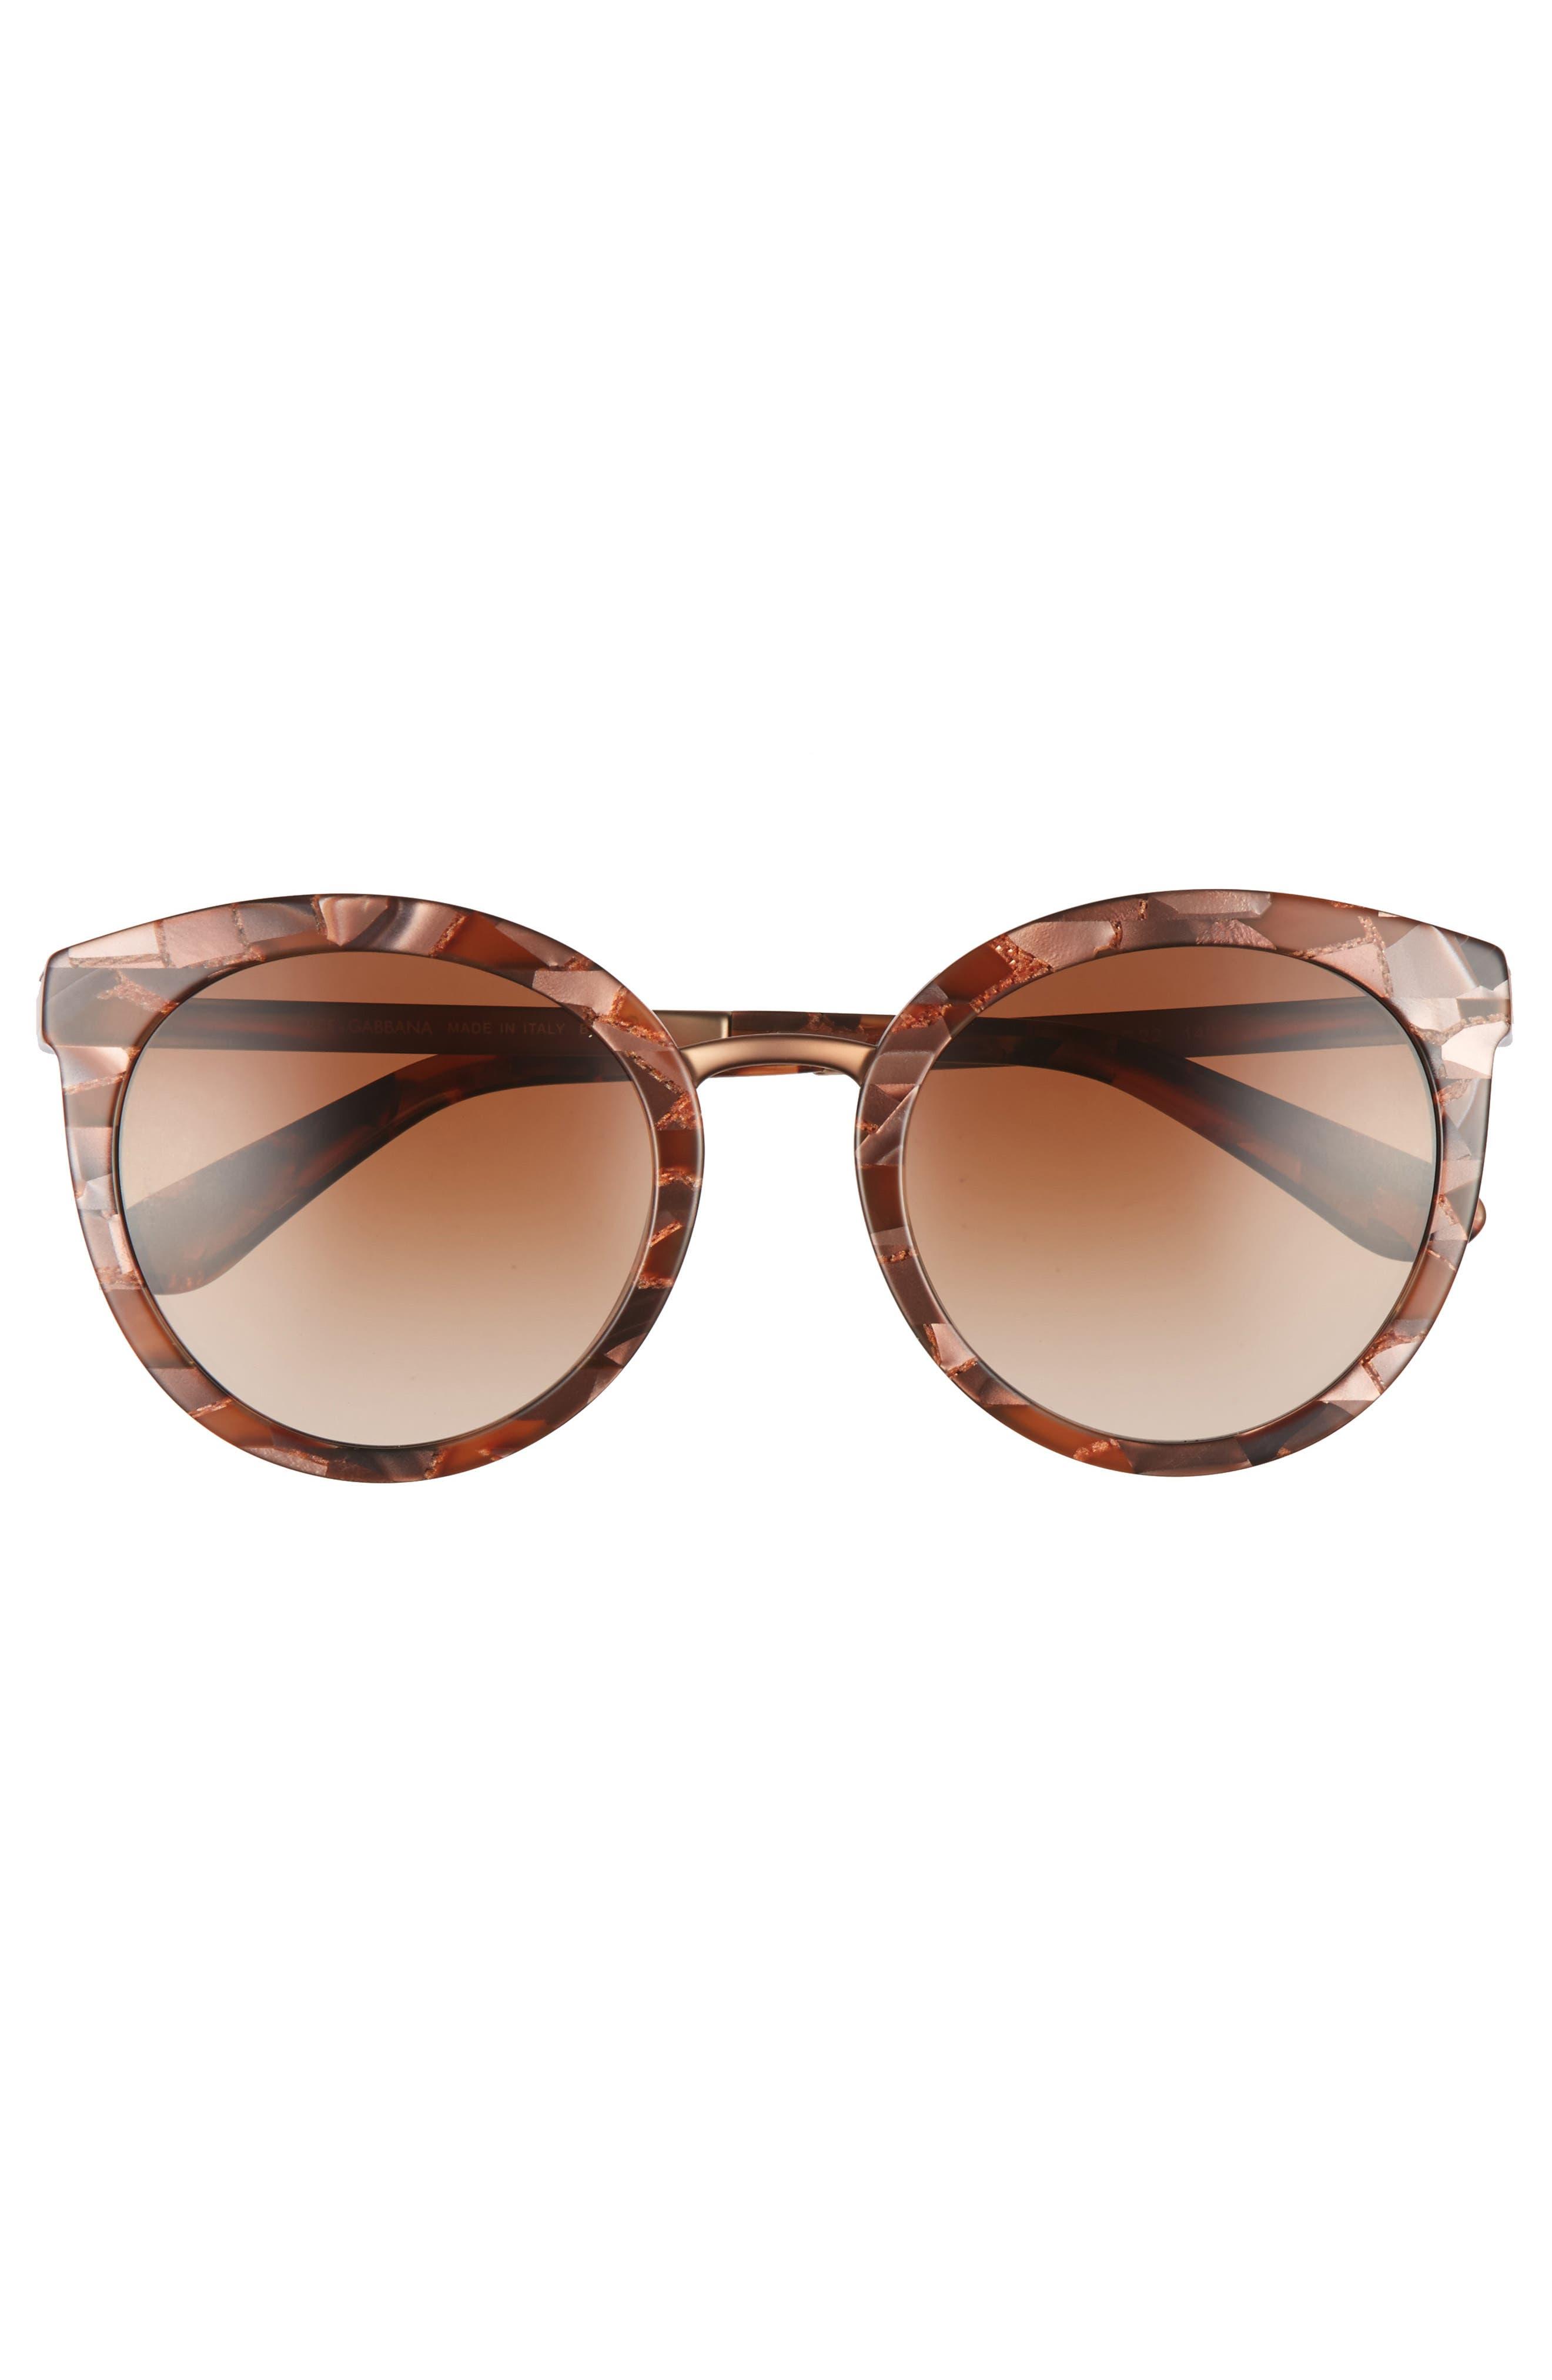 52mm Round Sunglasses,                             Alternate thumbnail 3, color,                             220